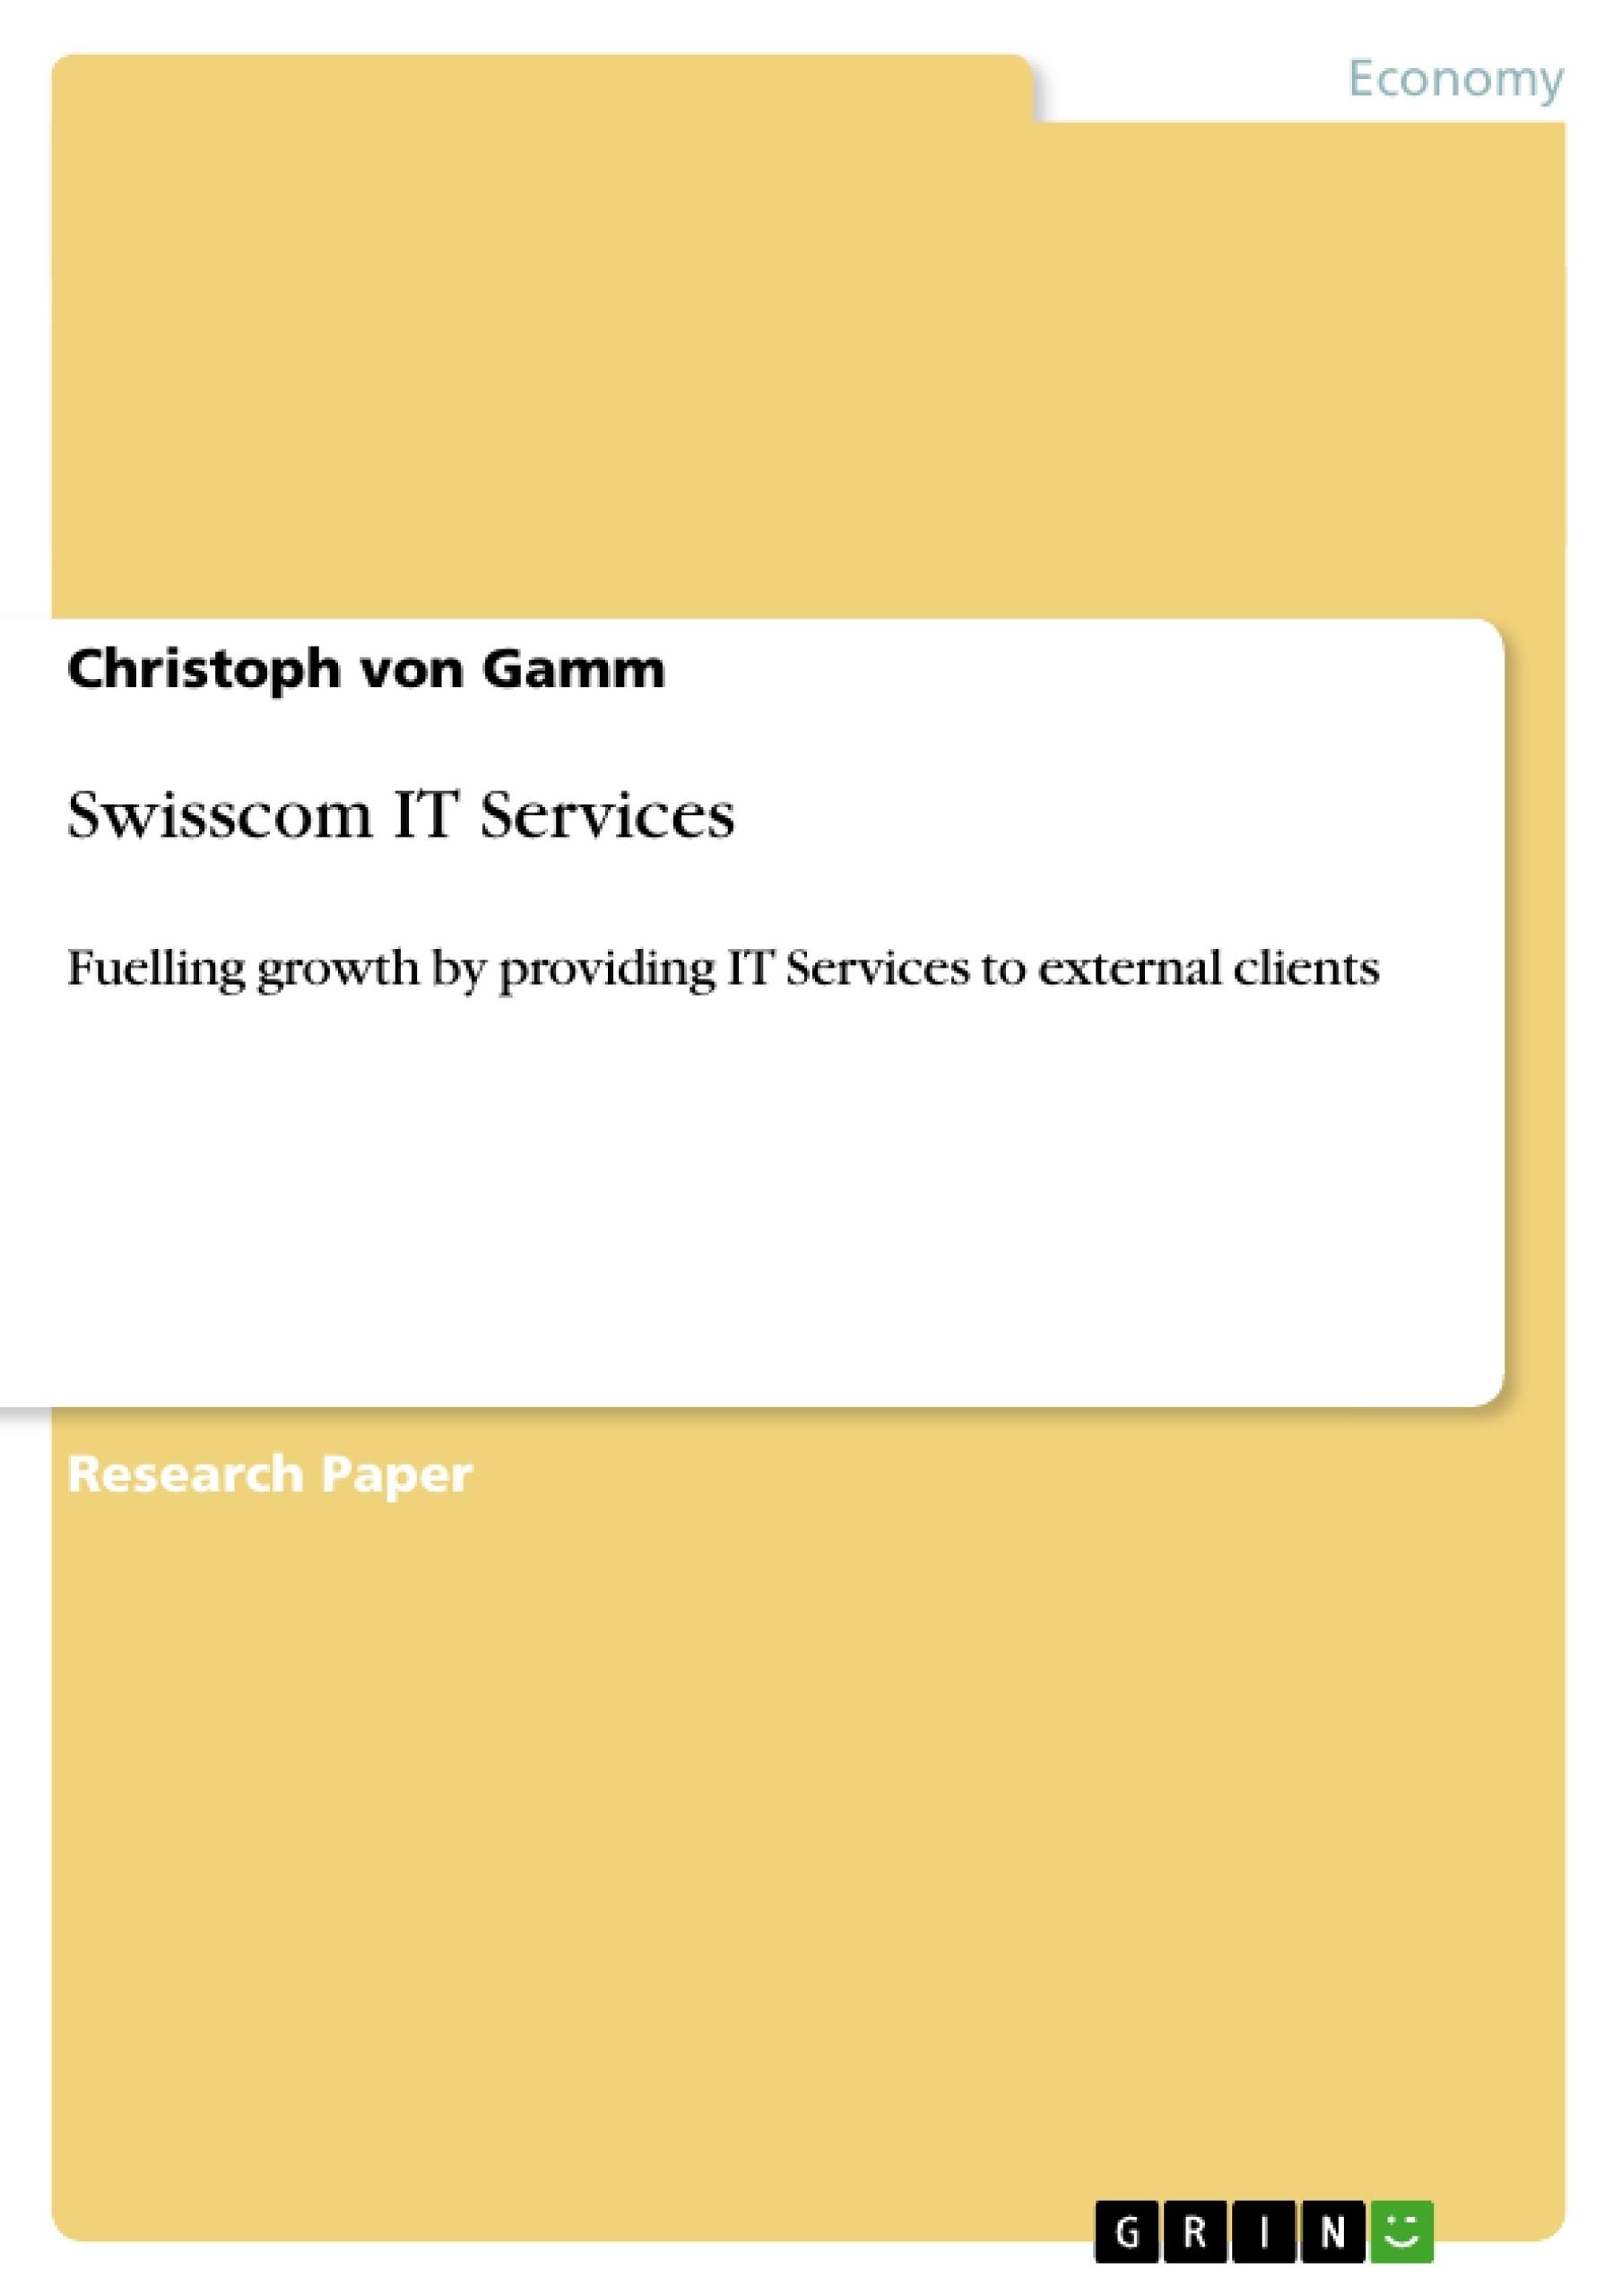 Title: Swisscom IT Services